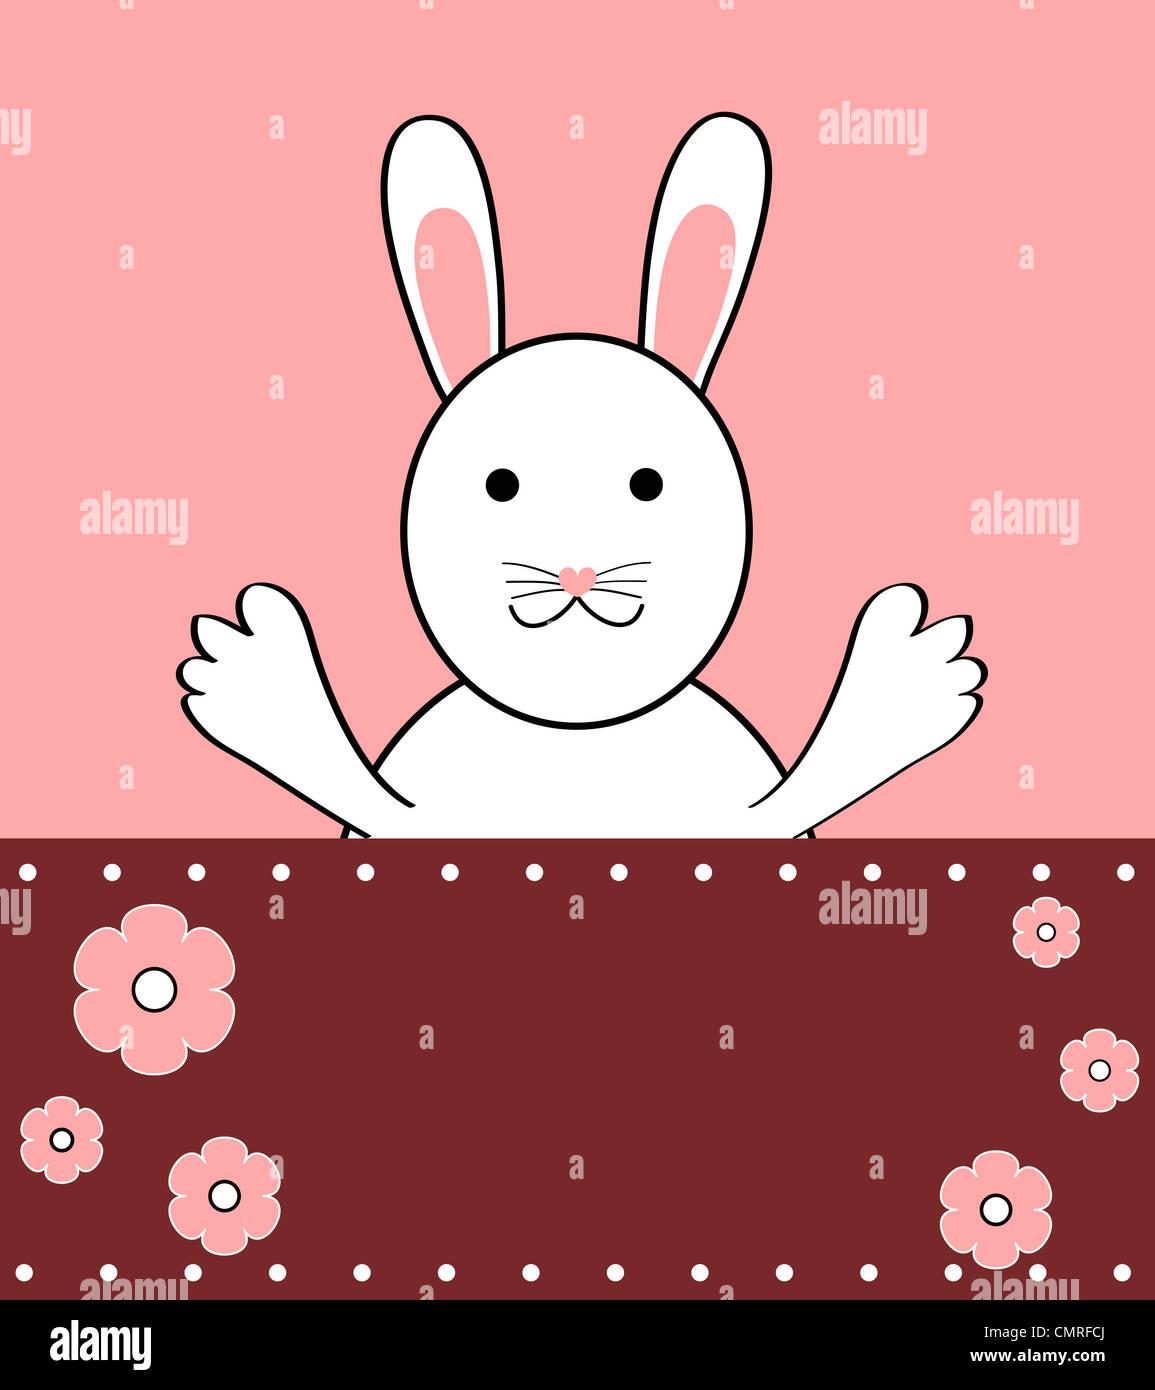 Bunny rabbit cartoon illustration Stock Photo